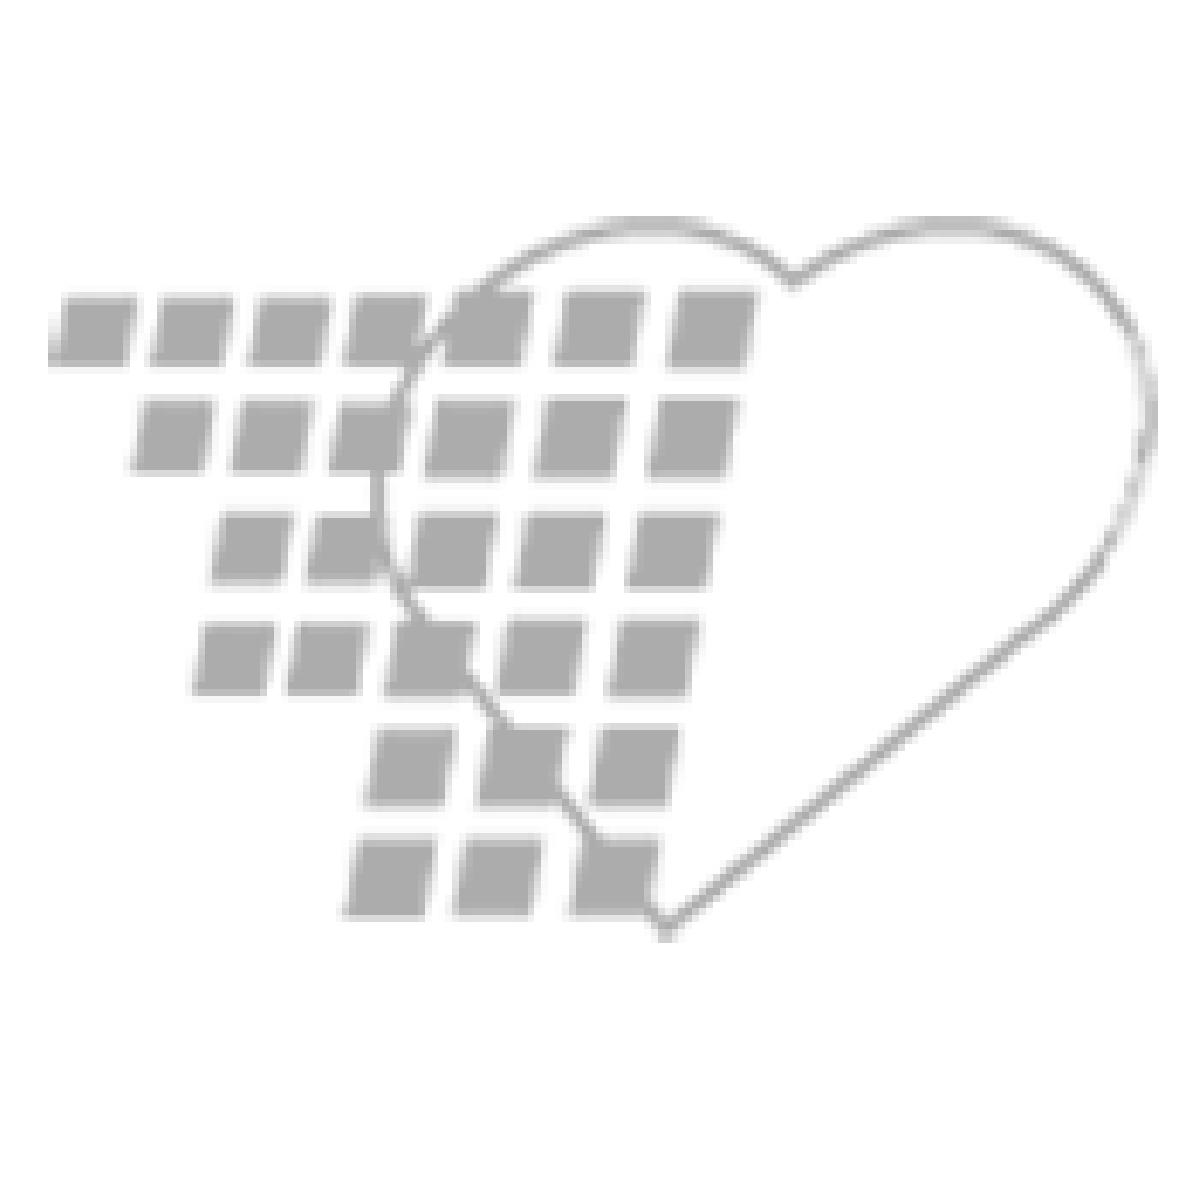 06-93-3530 - AccessRx-3 Tier